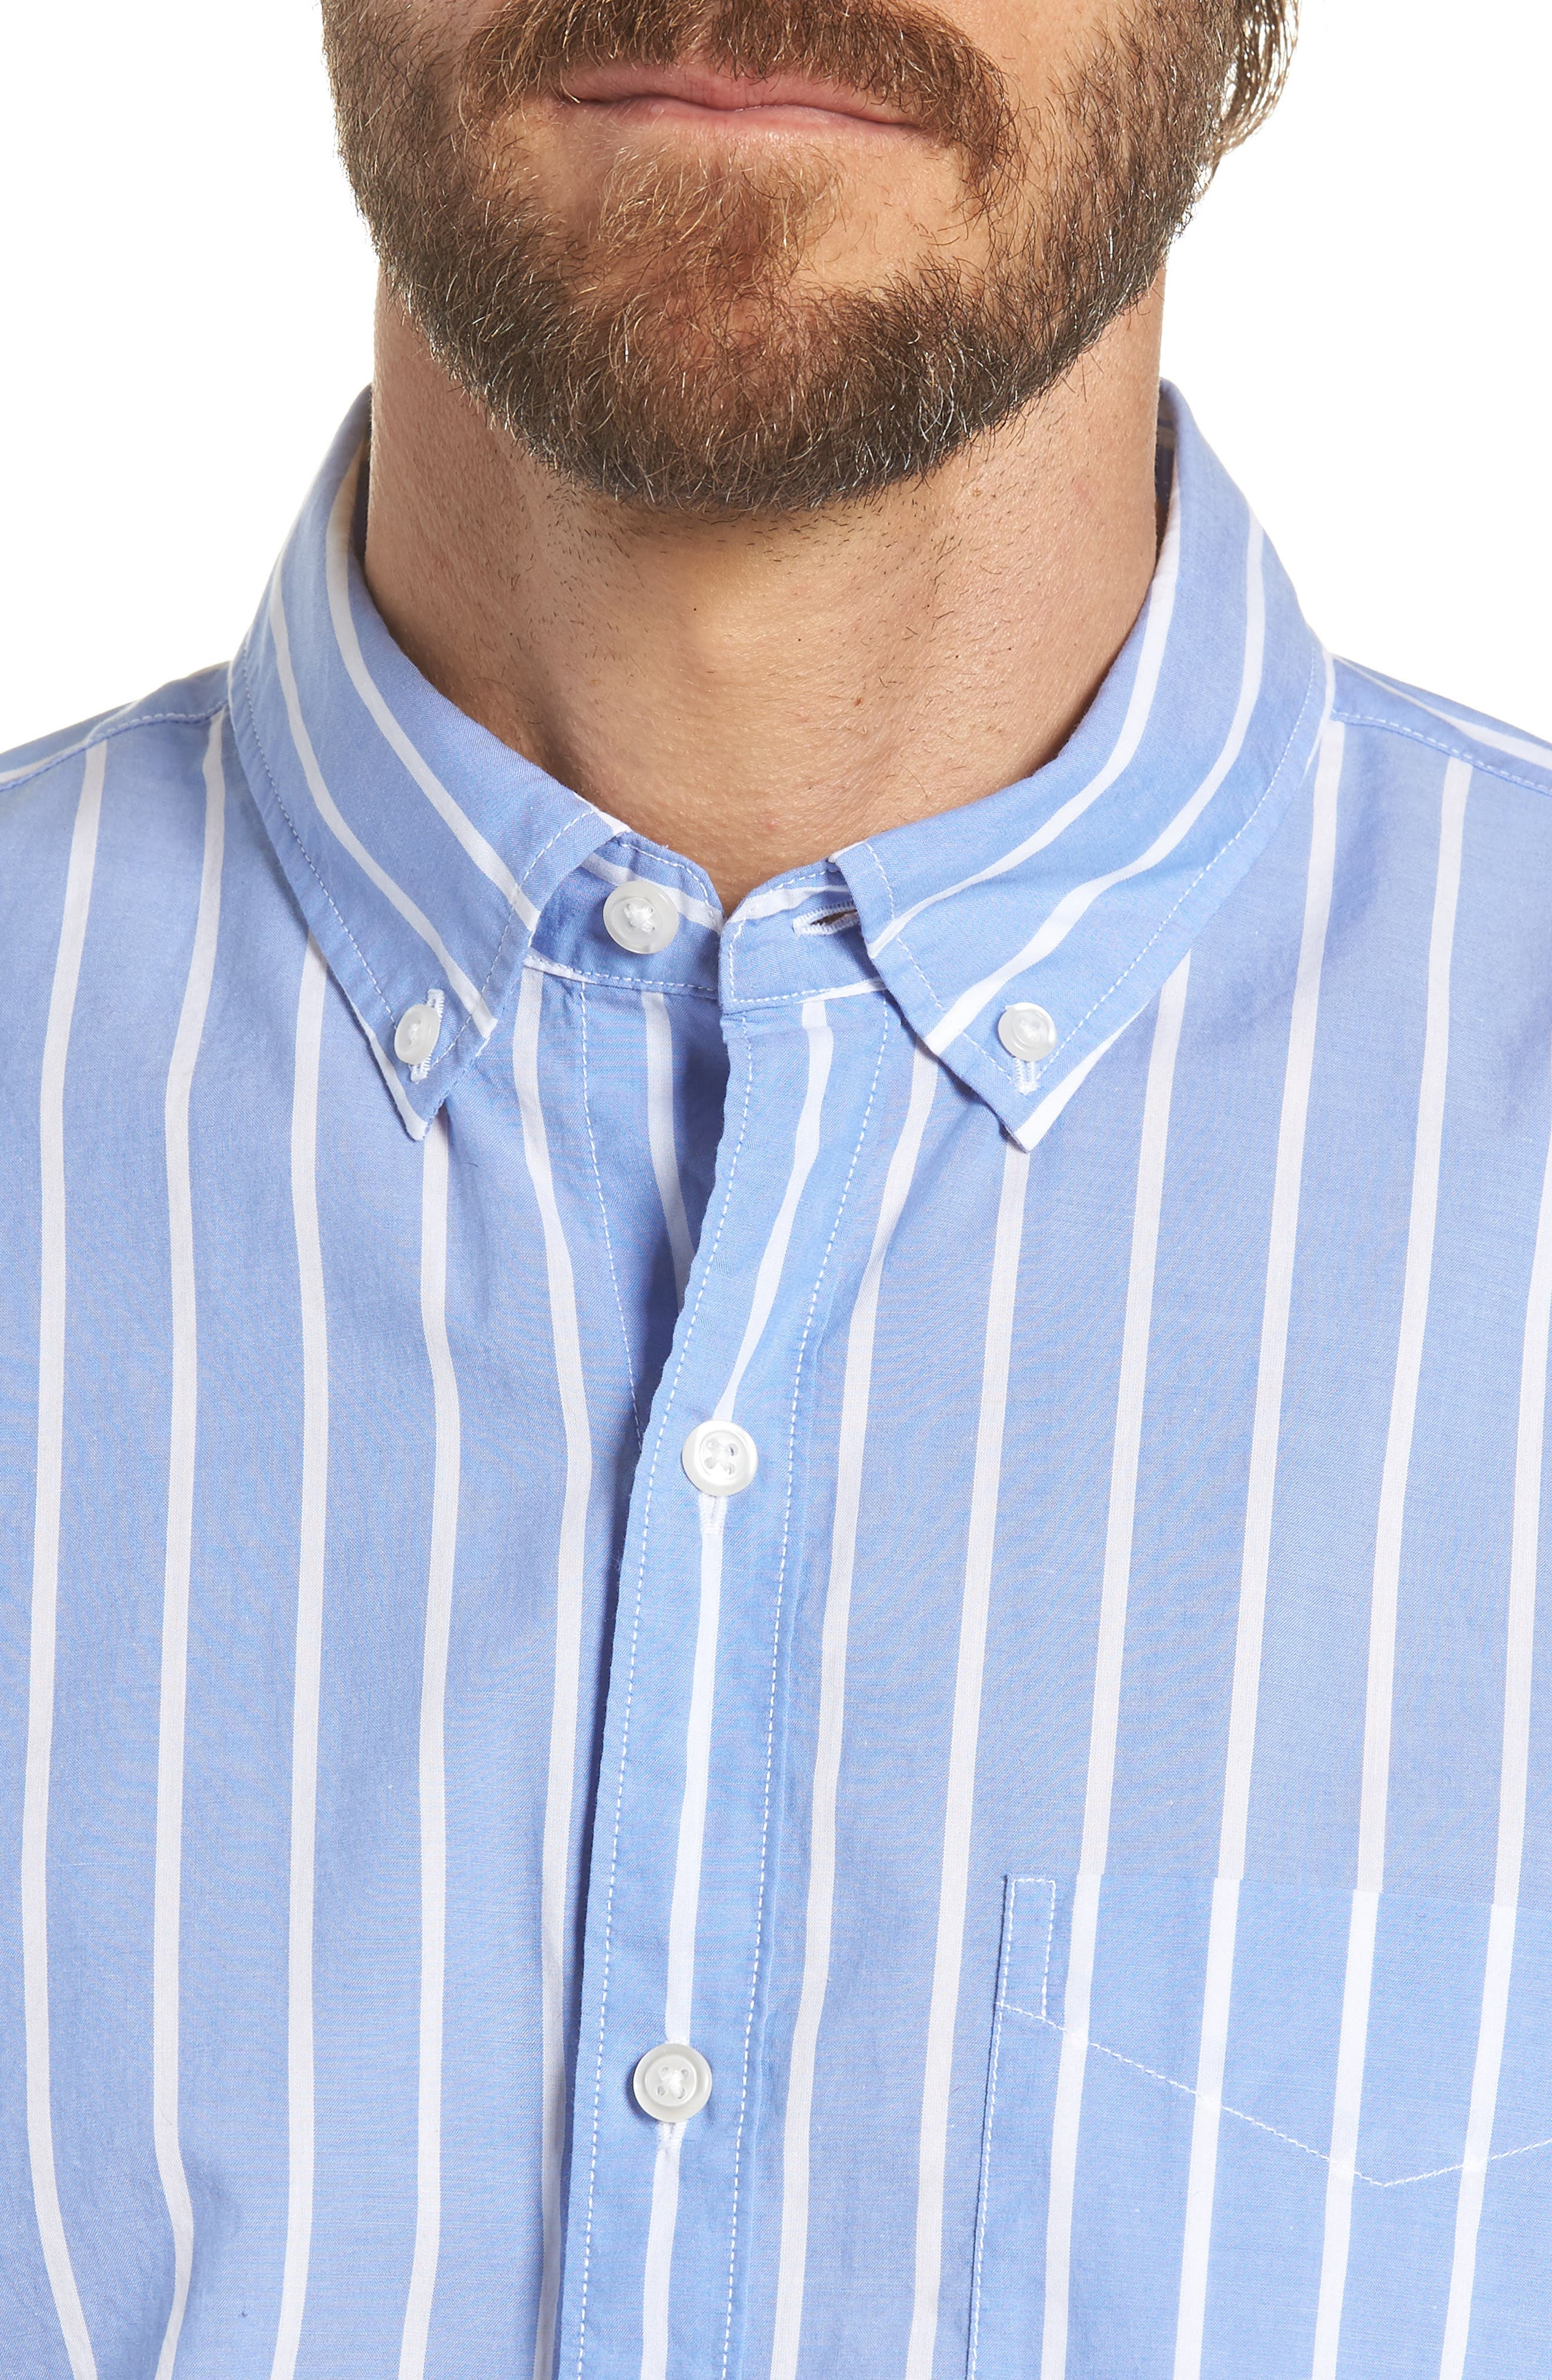 Summerweight Slim Fit Stripe Sport Shirt,                             Alternate thumbnail 2, color,                             Caste Hill Stripe Blue